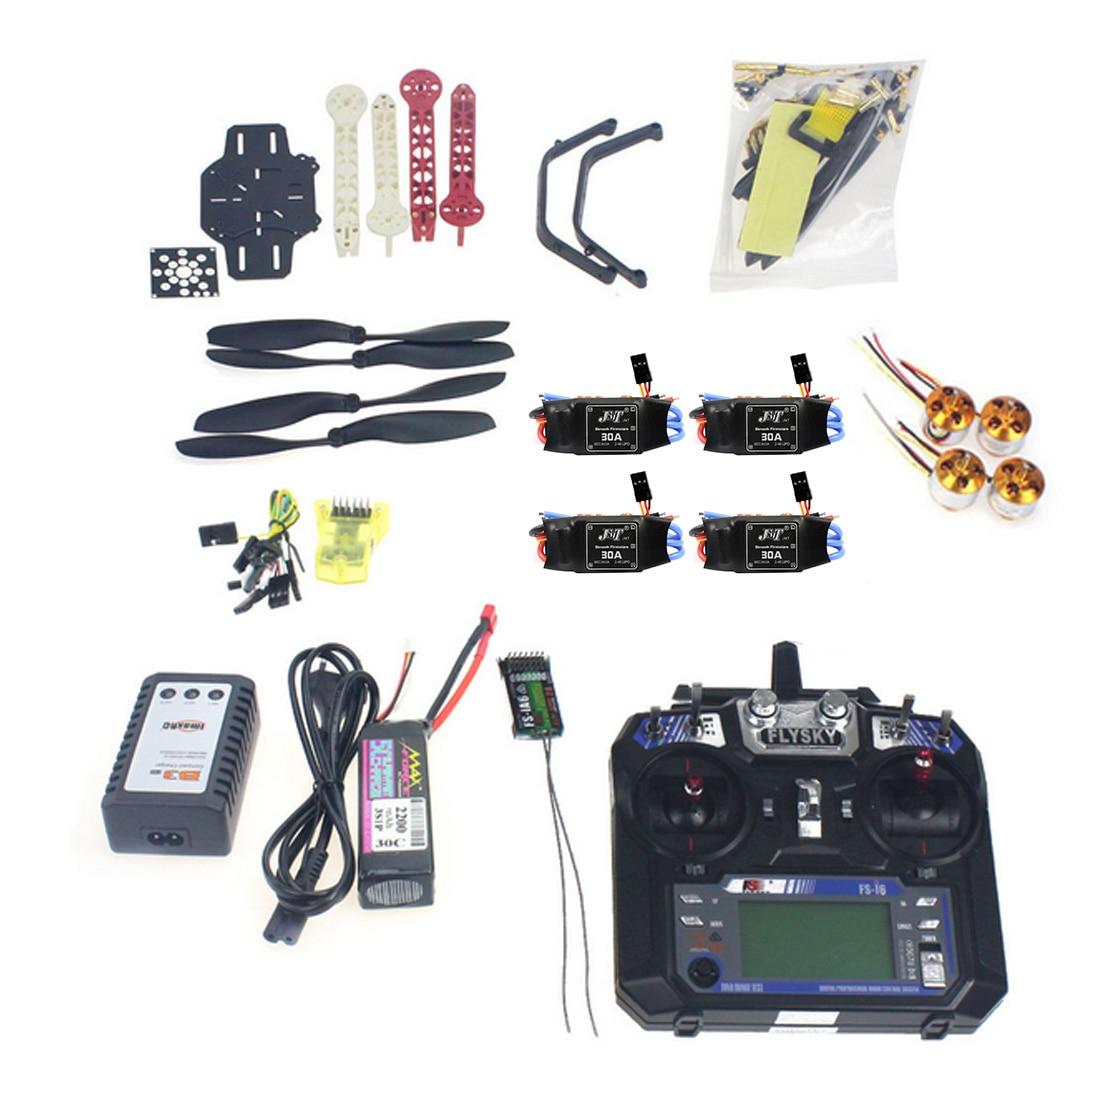 F02471-F Kit Completo RC Drone Quadrocopter Aeronaves Kit F330 Controle de Vôo MultiCopter Quadro MINI CC3D FS-i6 Flysky TX